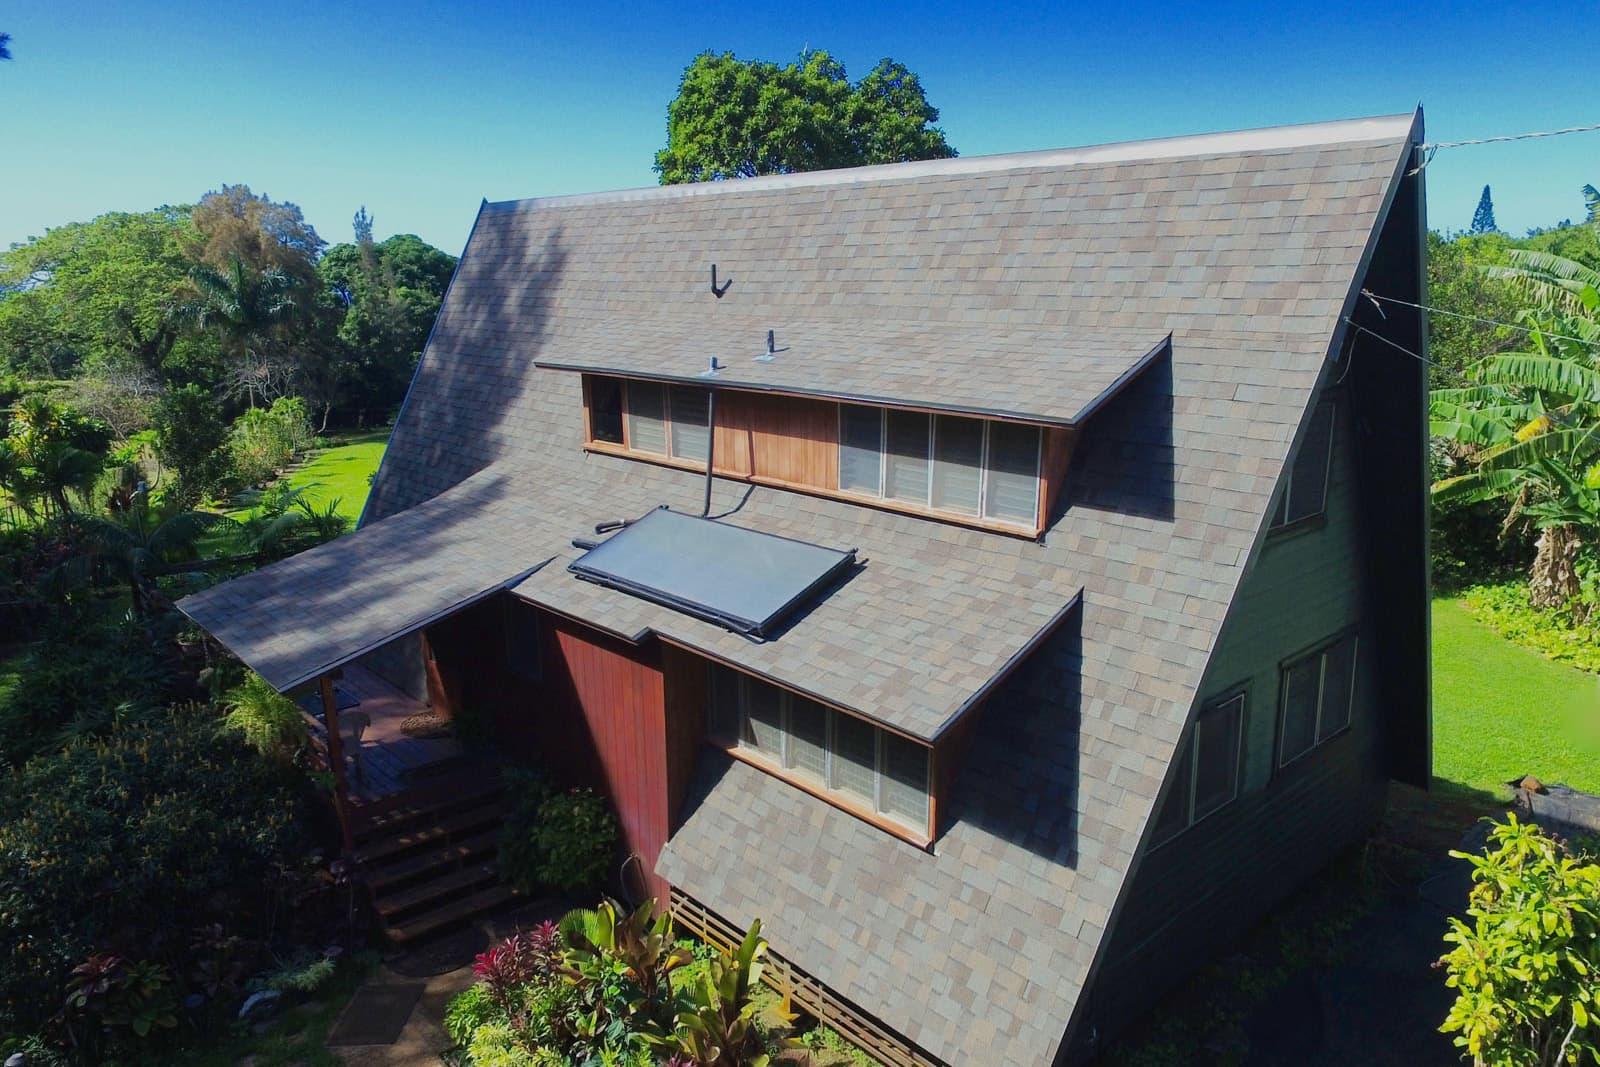 Honolulu Roofing Company Roofing Contractors Hawaii